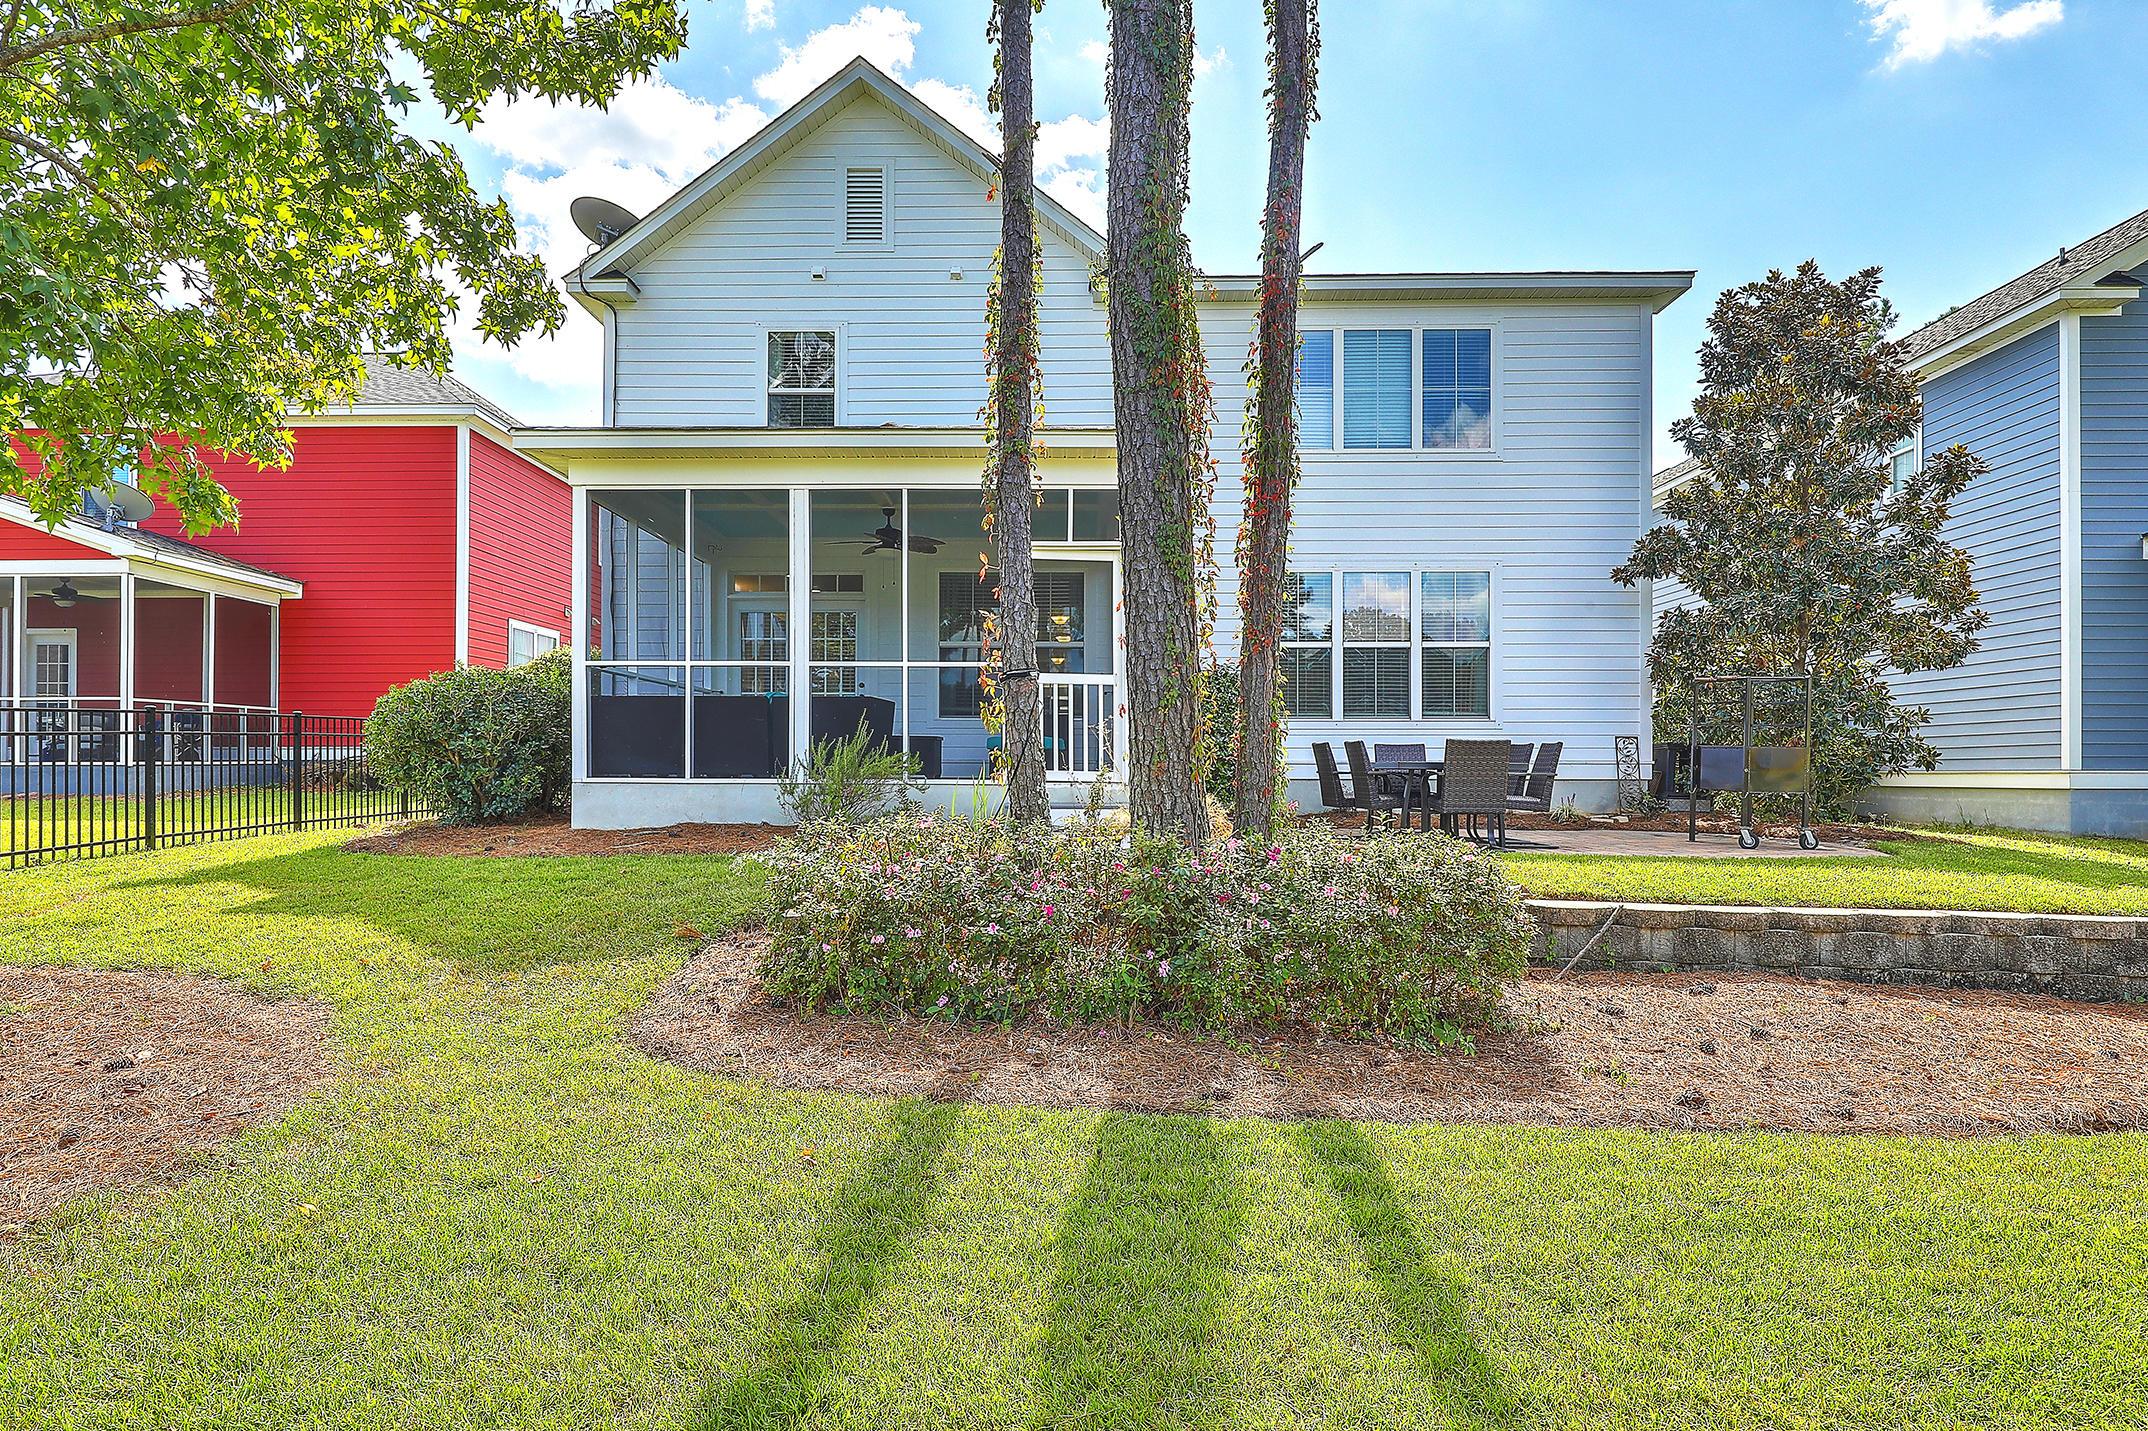 Branch Creek Homes For Sale - 304 Pond Hill, Summerville, SC - 3